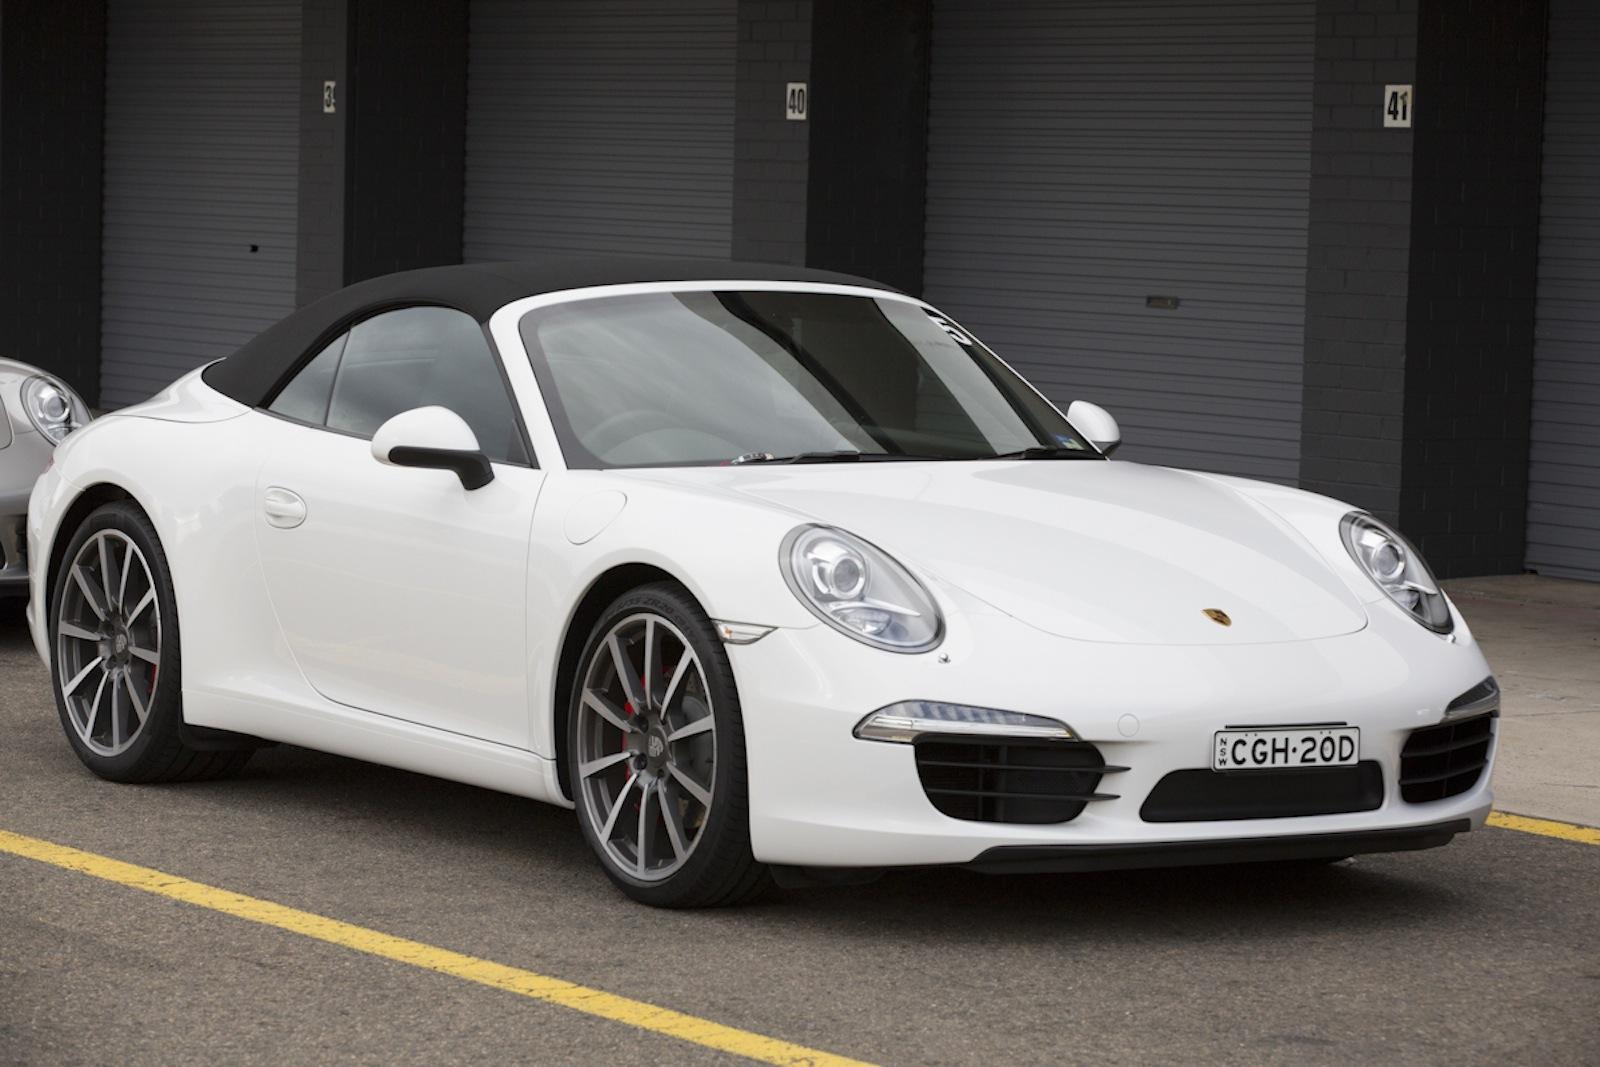 2013 porsche 911 carrera s cabriolet review photos caradvice. Black Bedroom Furniture Sets. Home Design Ideas